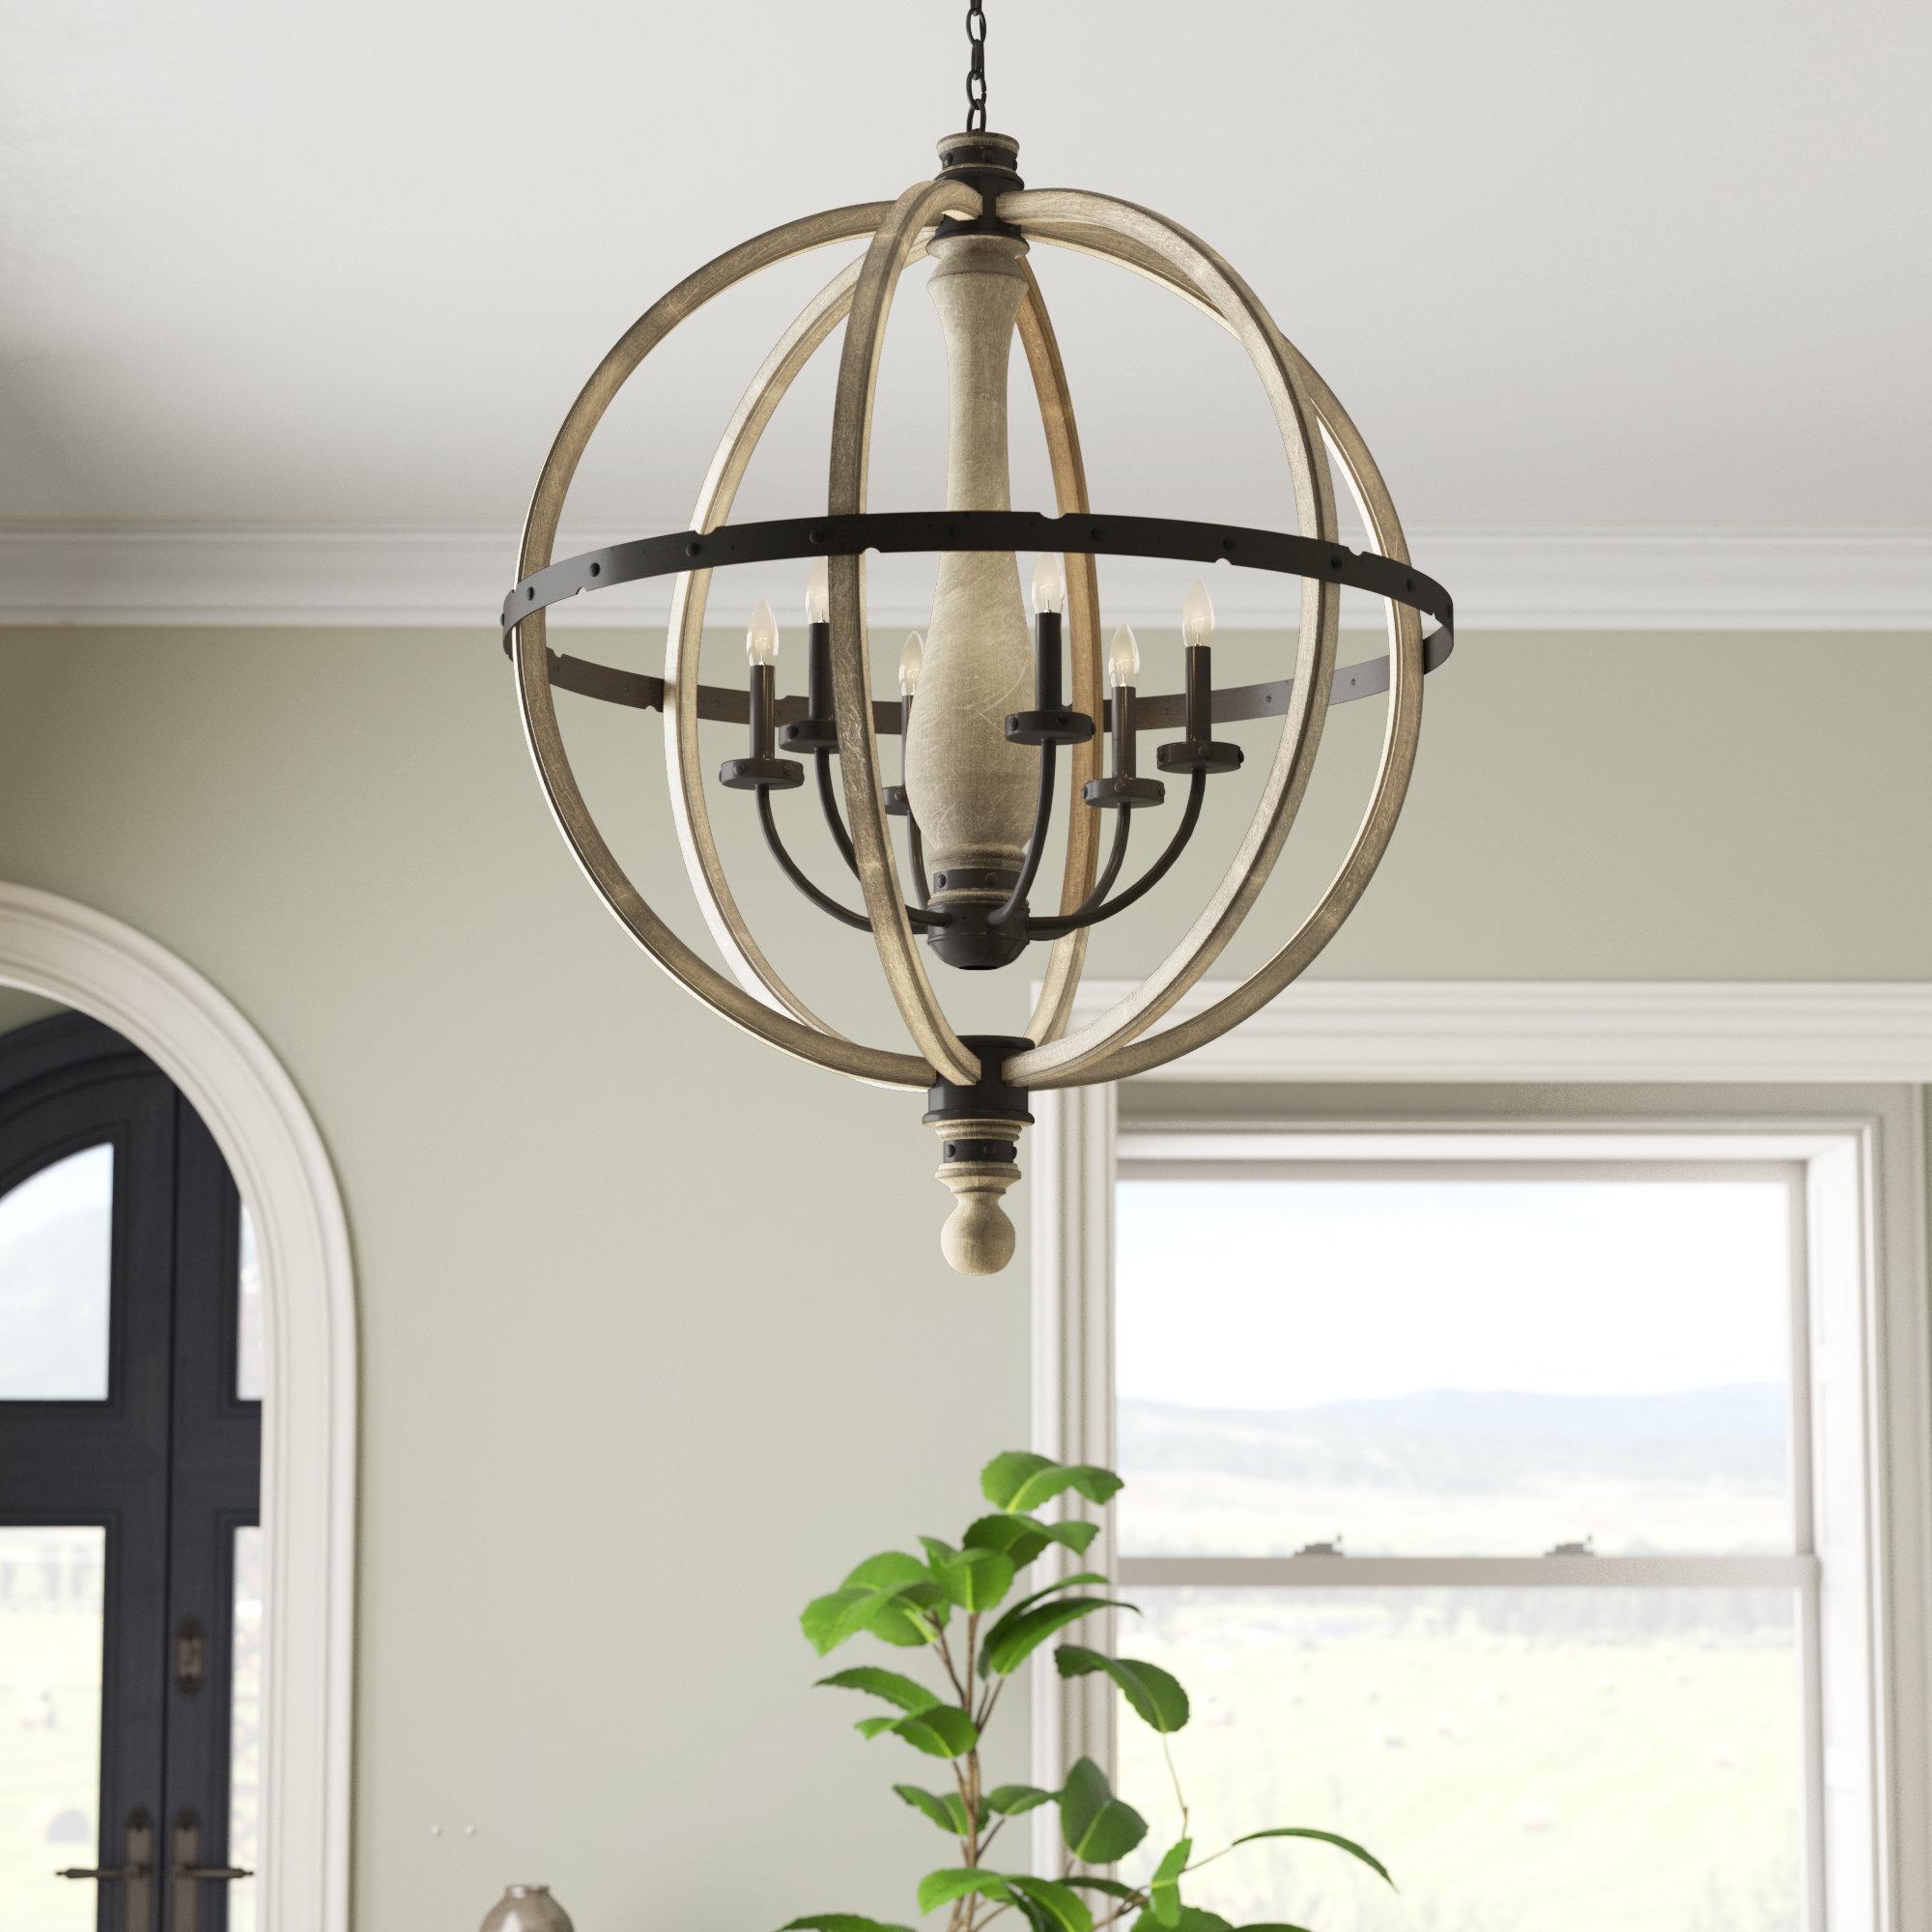 Elisabeth 6-Light Globe Chandelier throughout Donna 6-Light Globe Chandeliers (Image 13 of 30)